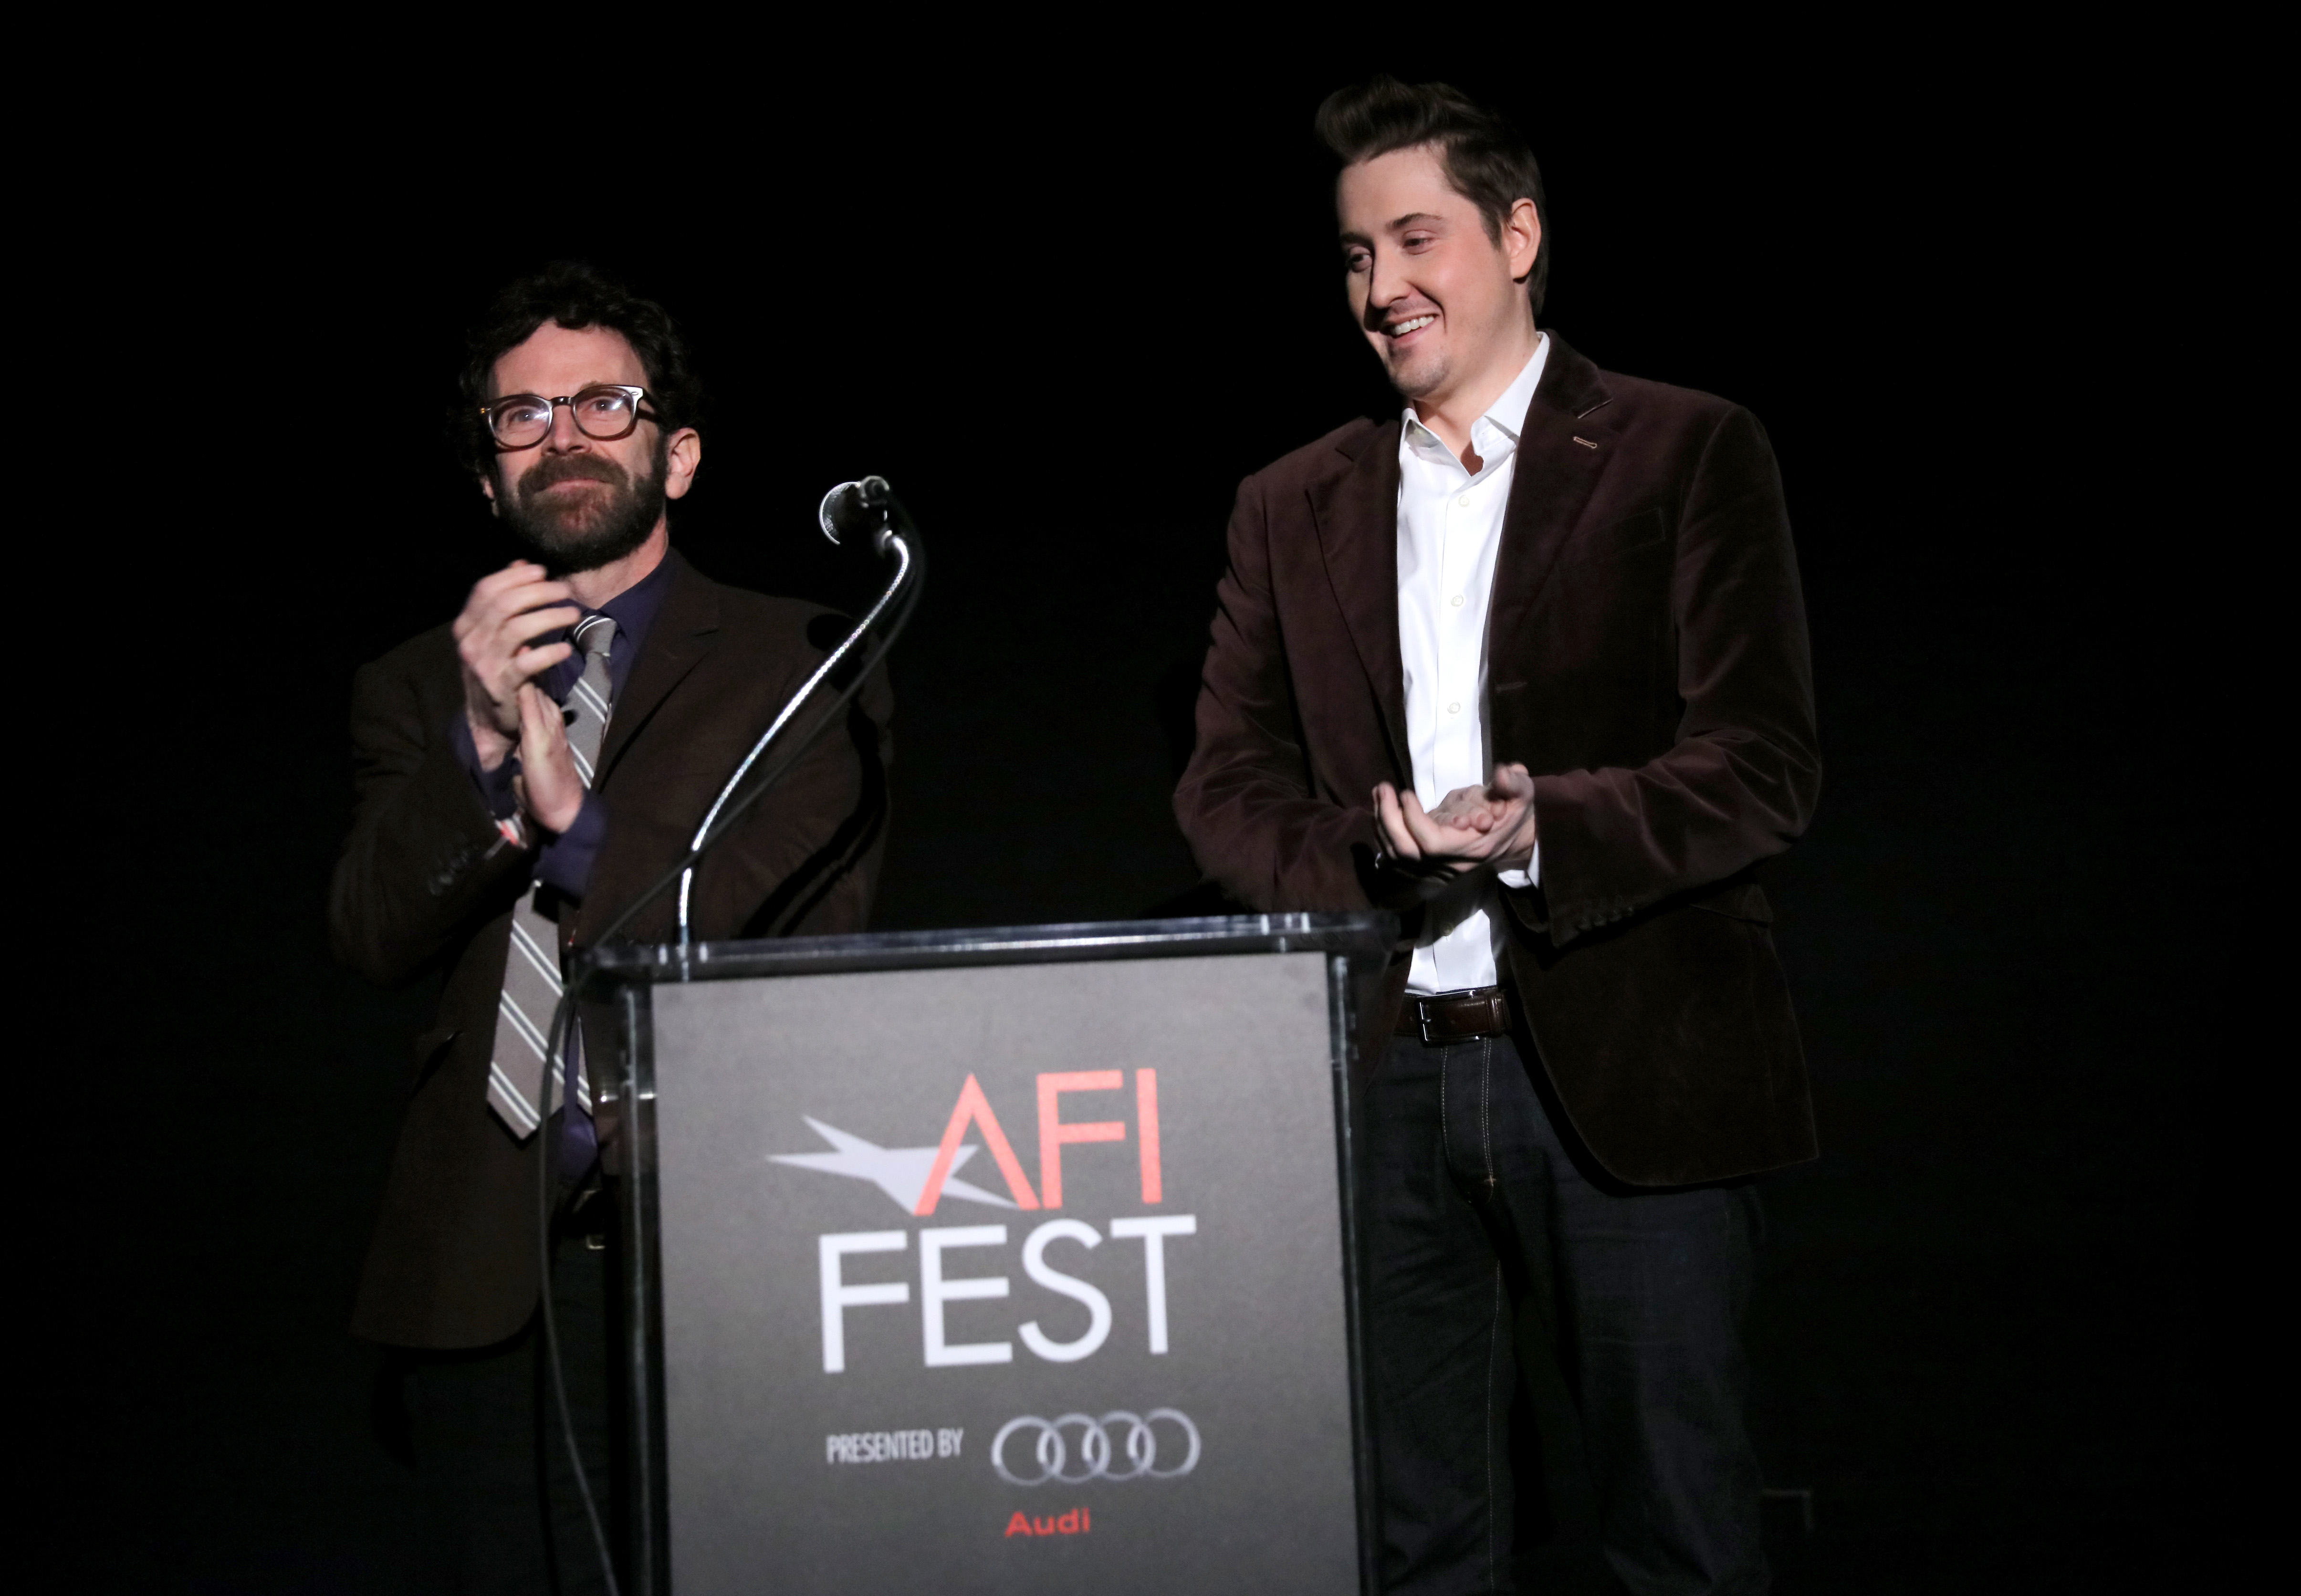 Anomalisa AFI Film Festival Screening And Q&A